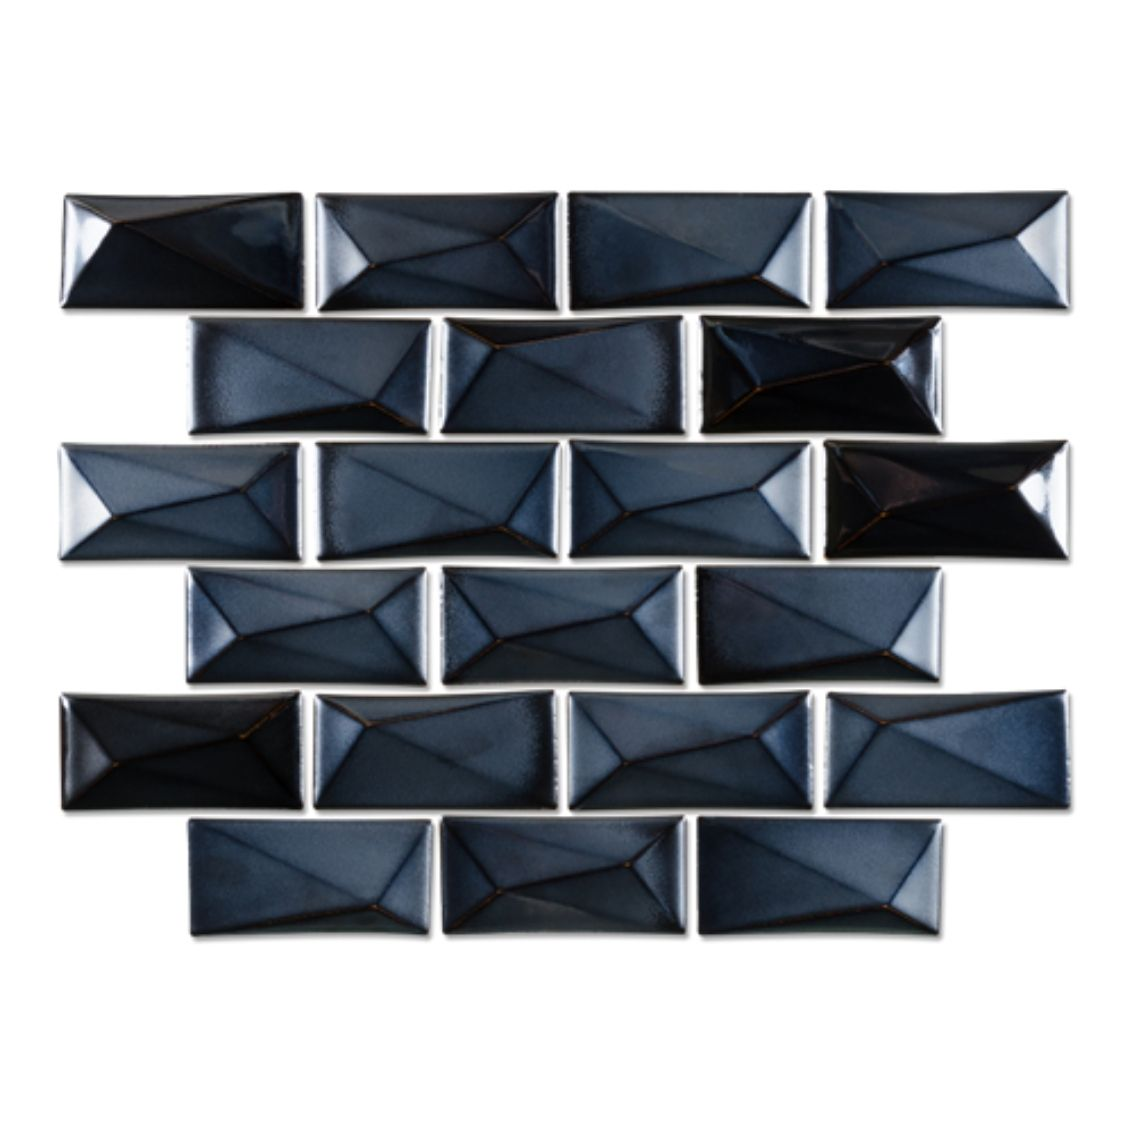 Pastilha Netuno 5x10 cm <br /><b>R$ 153,90 M² </b><br />Cx 0,63 M² <b> R$ 96,96</b>